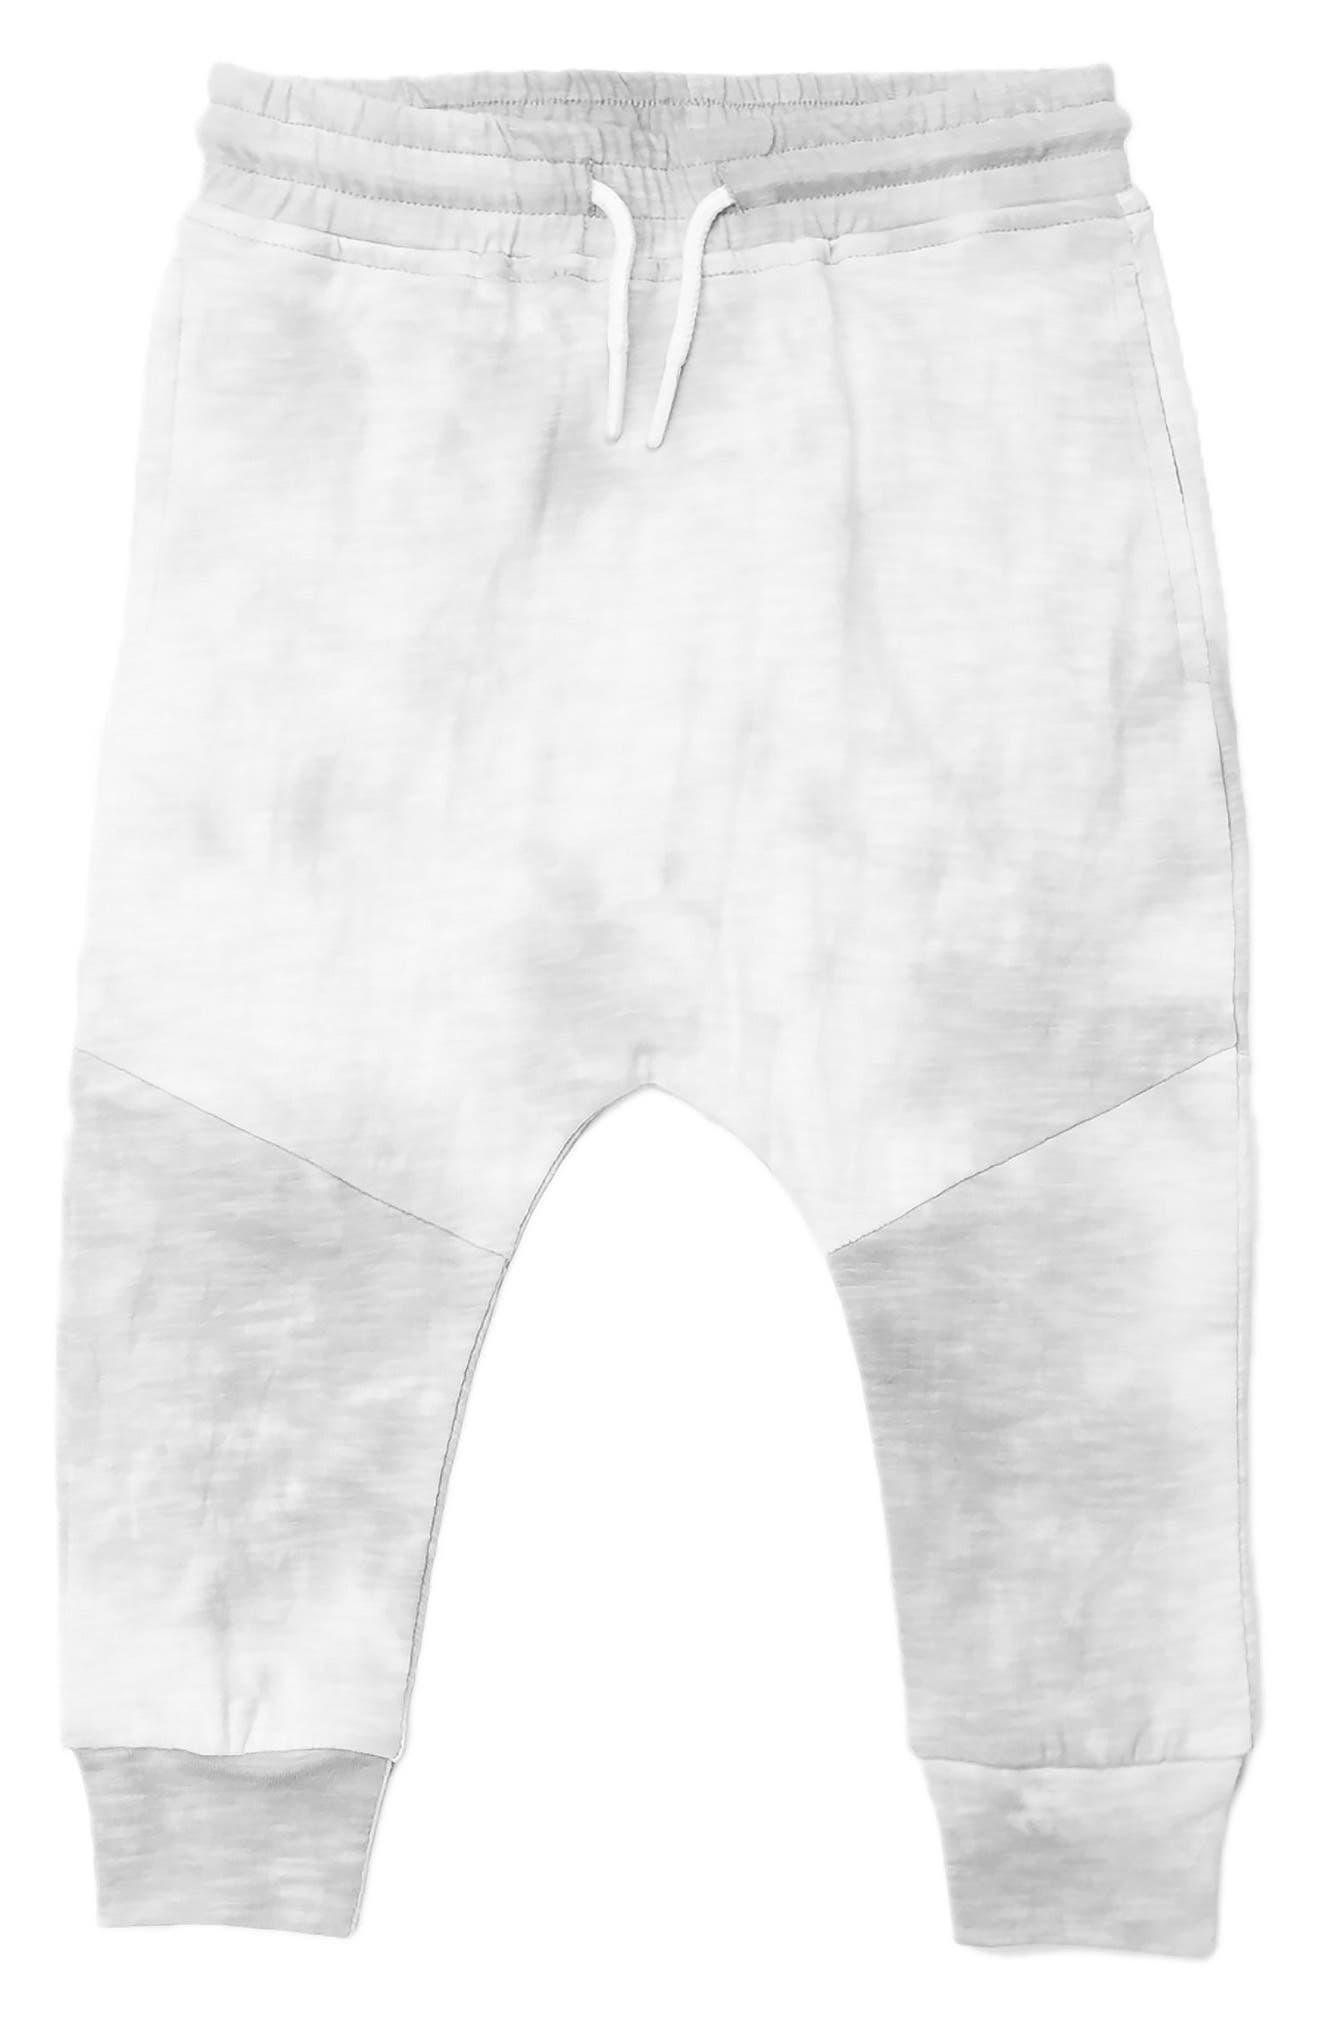 Ax Harem Pants,                         Main,                         color, Grey